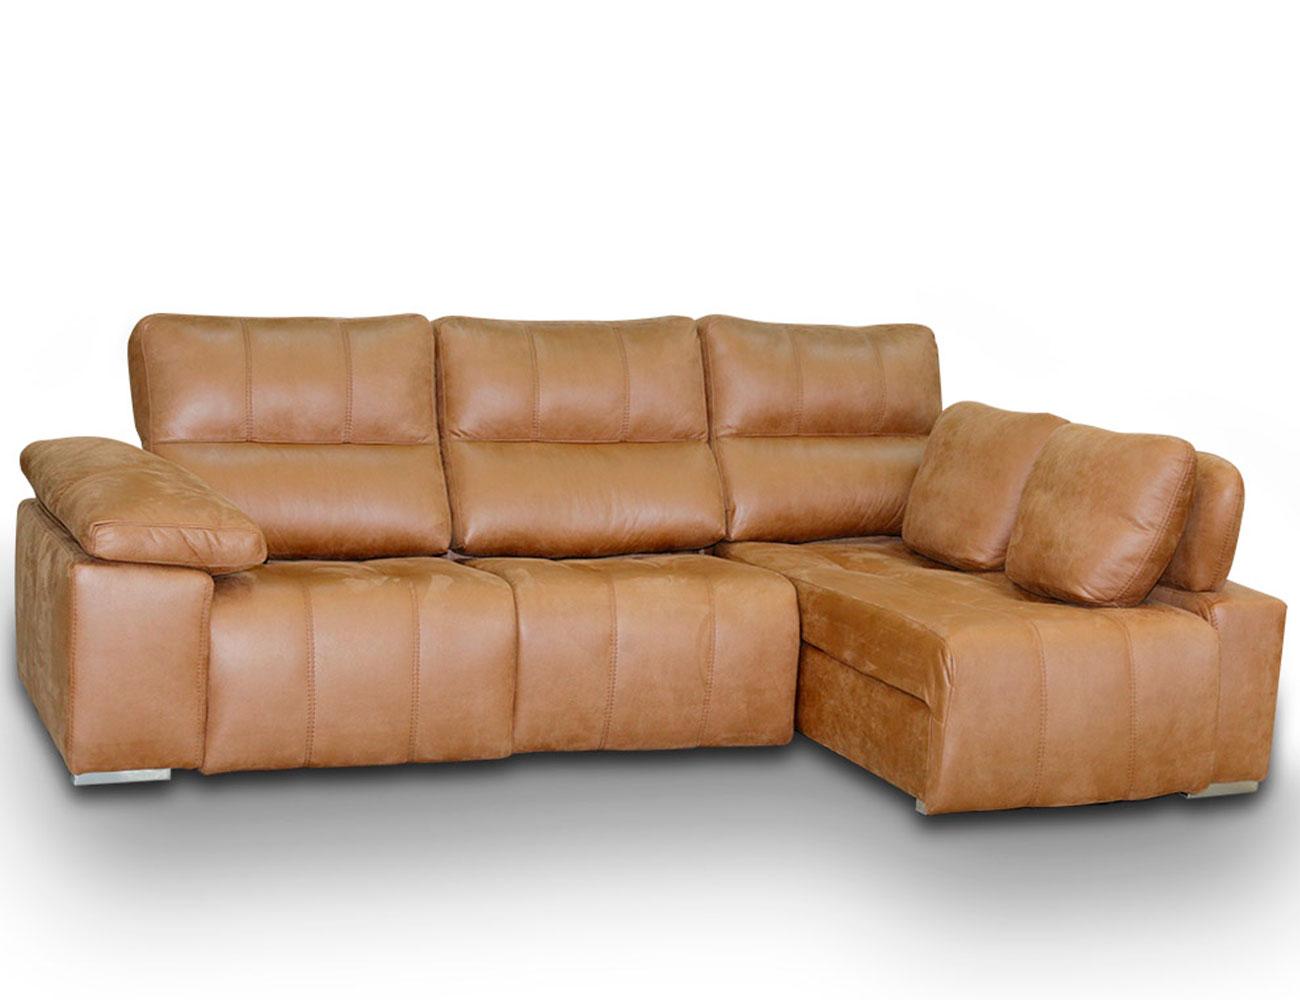 Sofa chaiselongue relax 2 motores anti manchas33